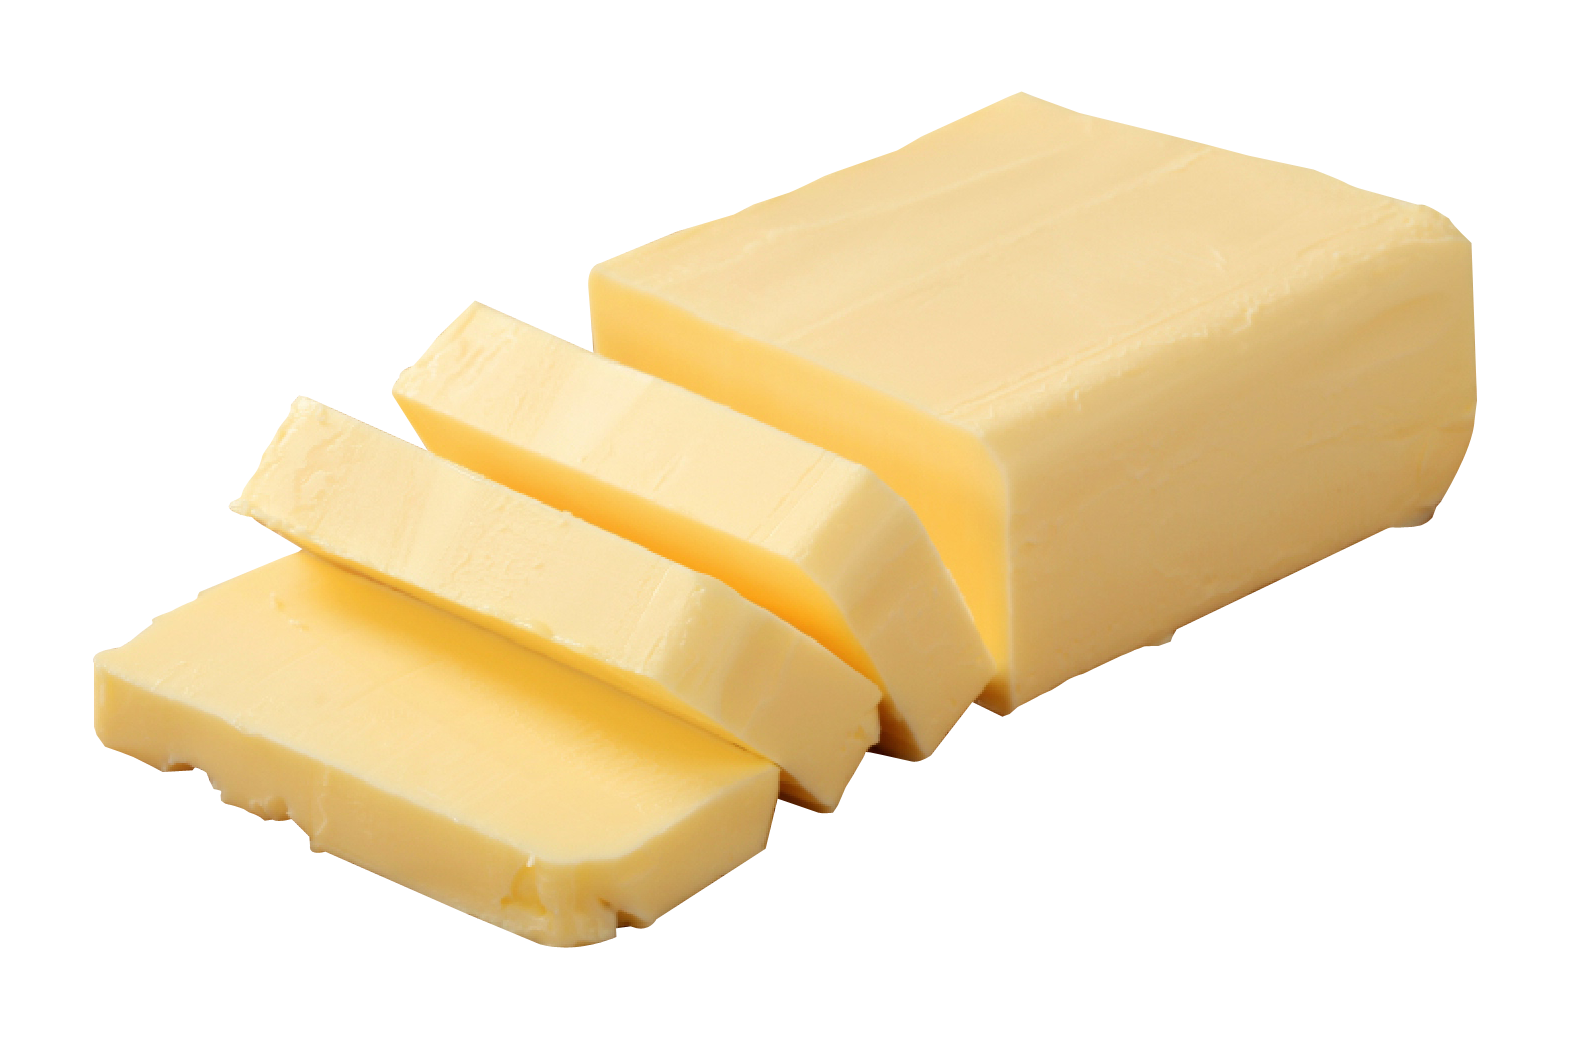 Butter png image purepng. Milk clipart buttermilk